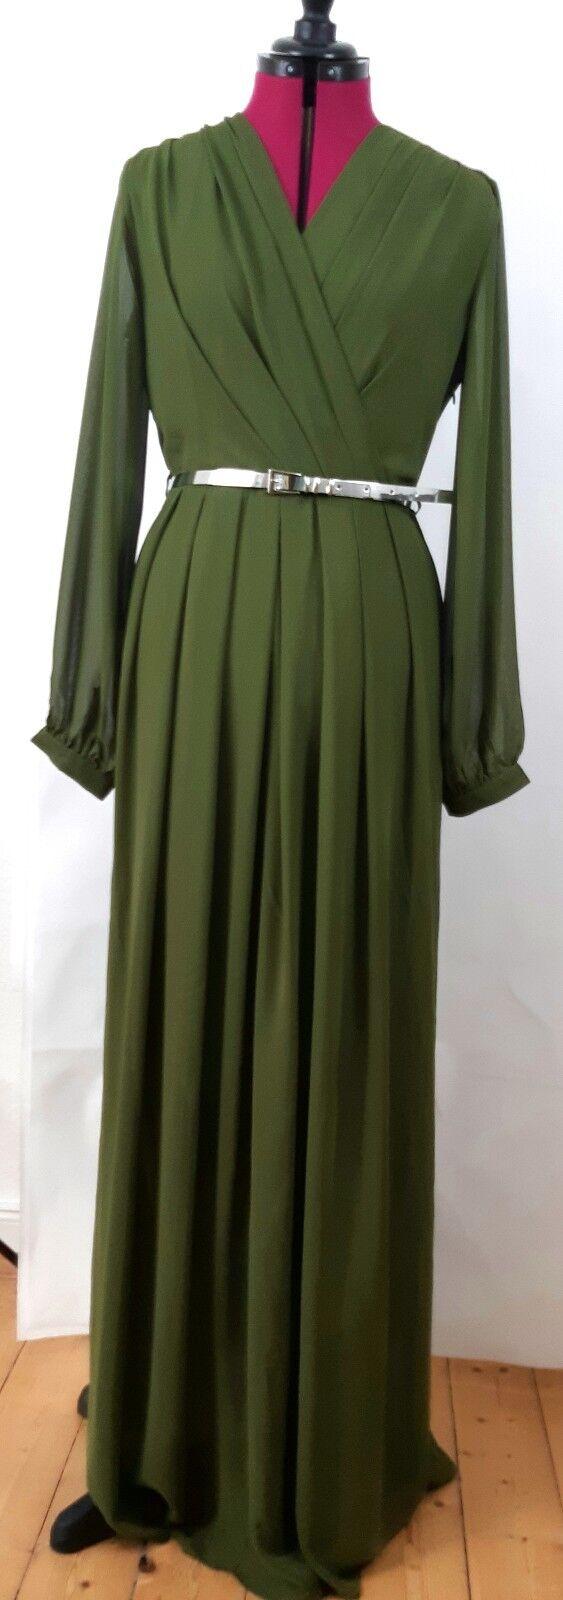 Abendkleid Gr. 44 Grün dunkelgrün bodenlang